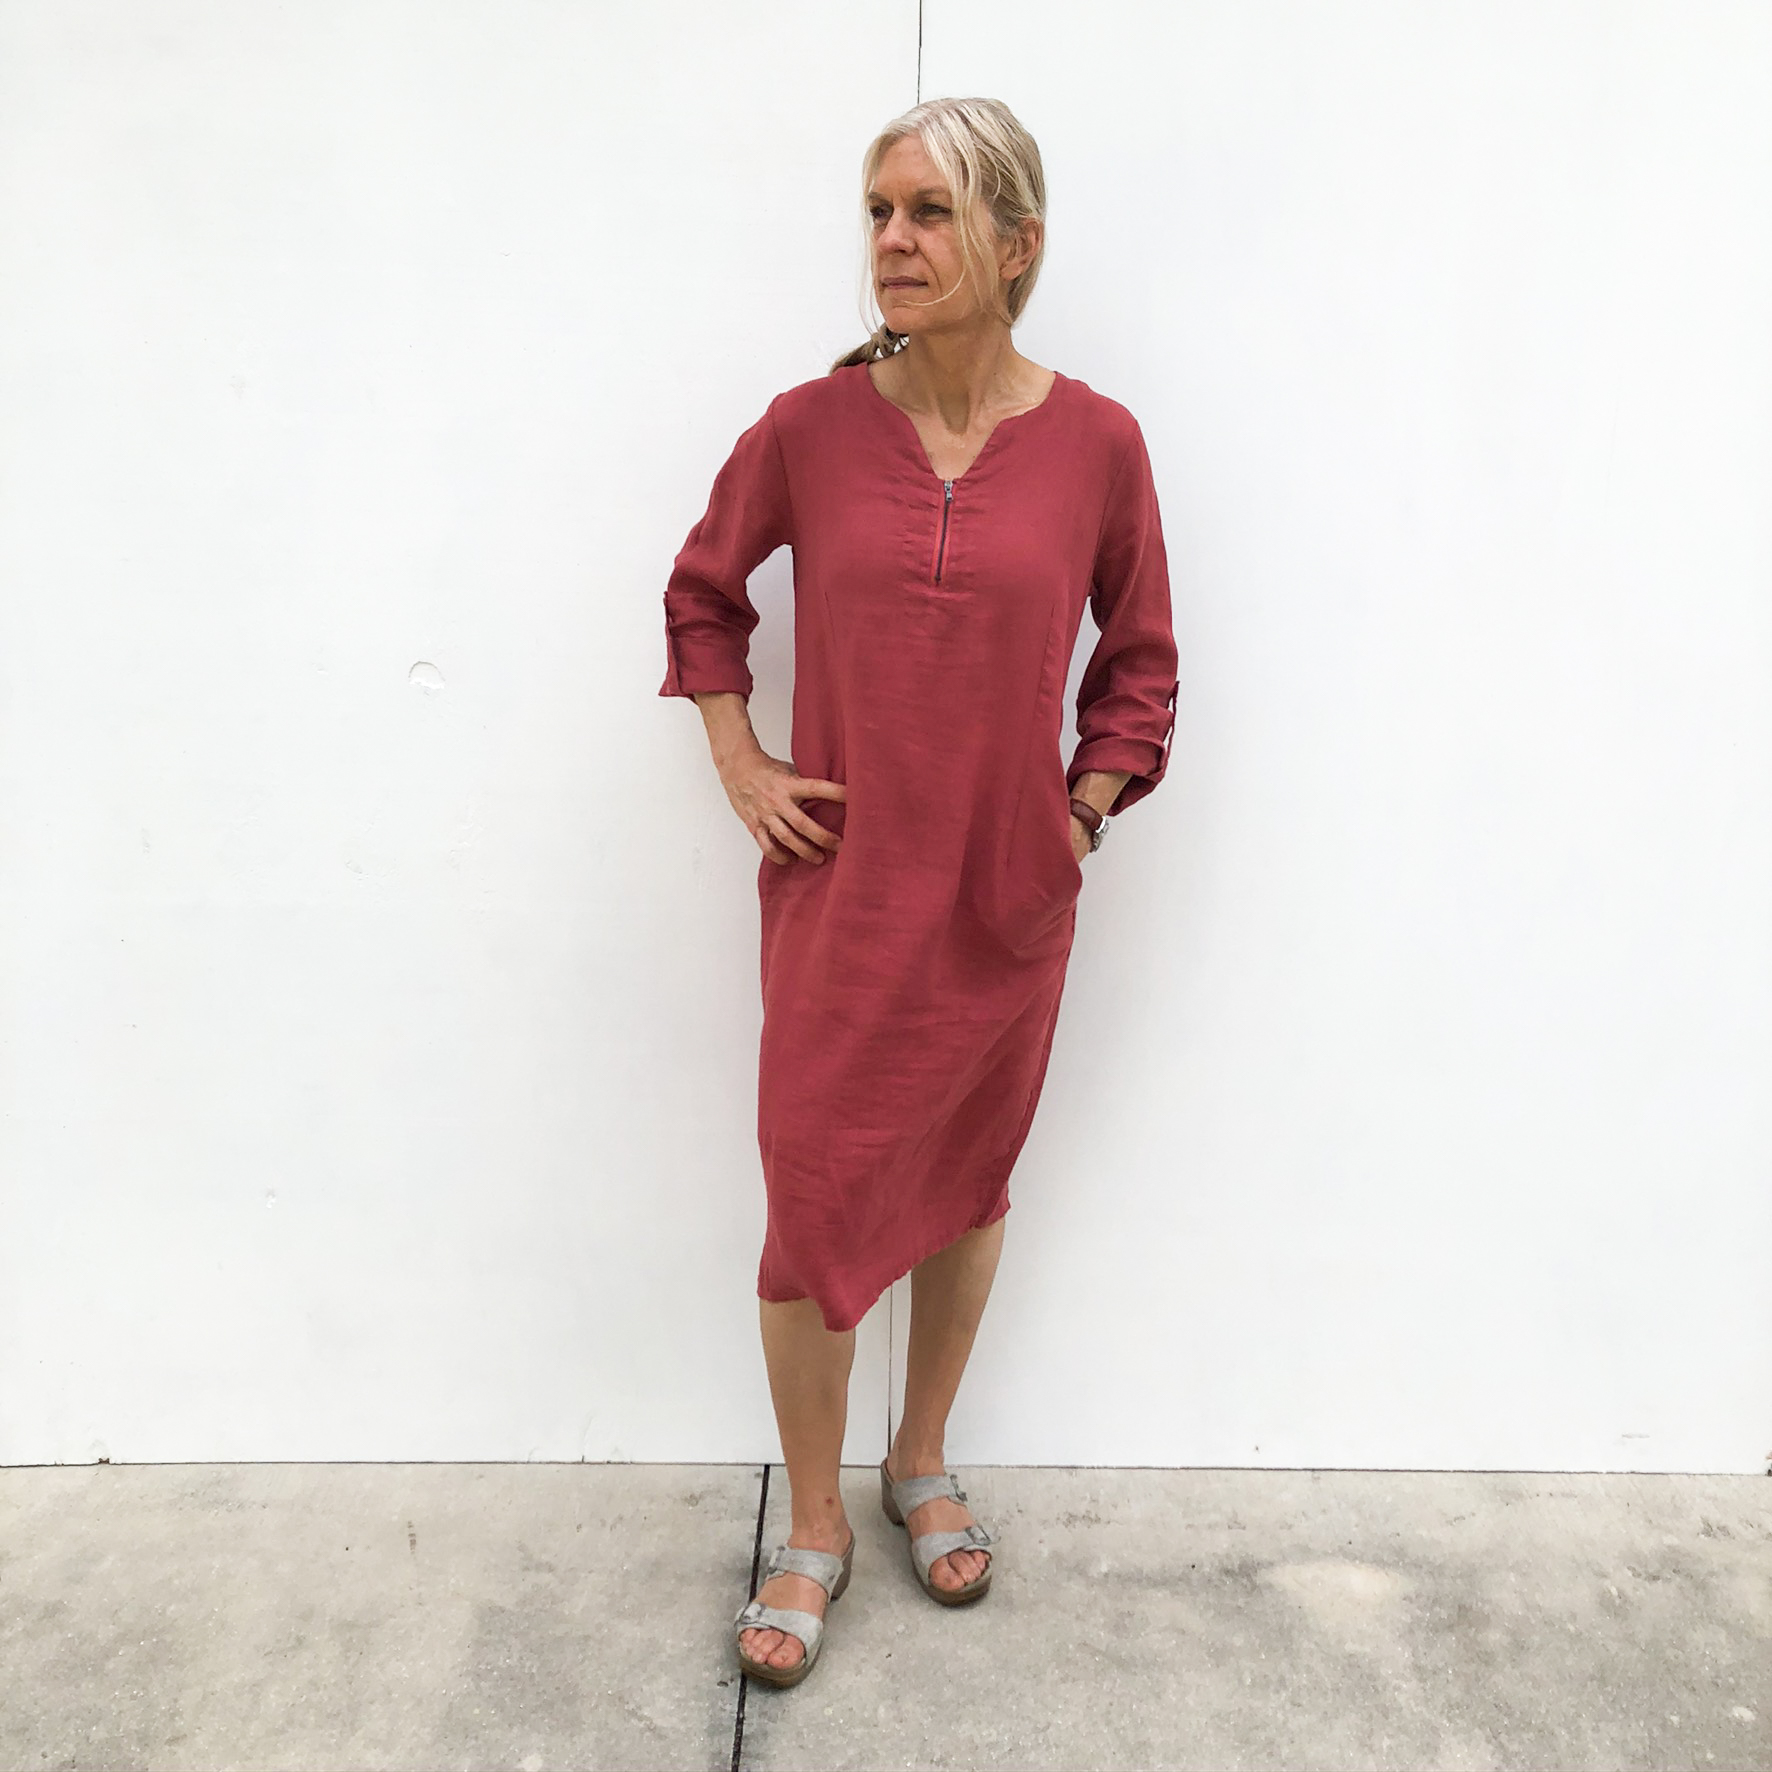 Zipper Dress on Model - Rust